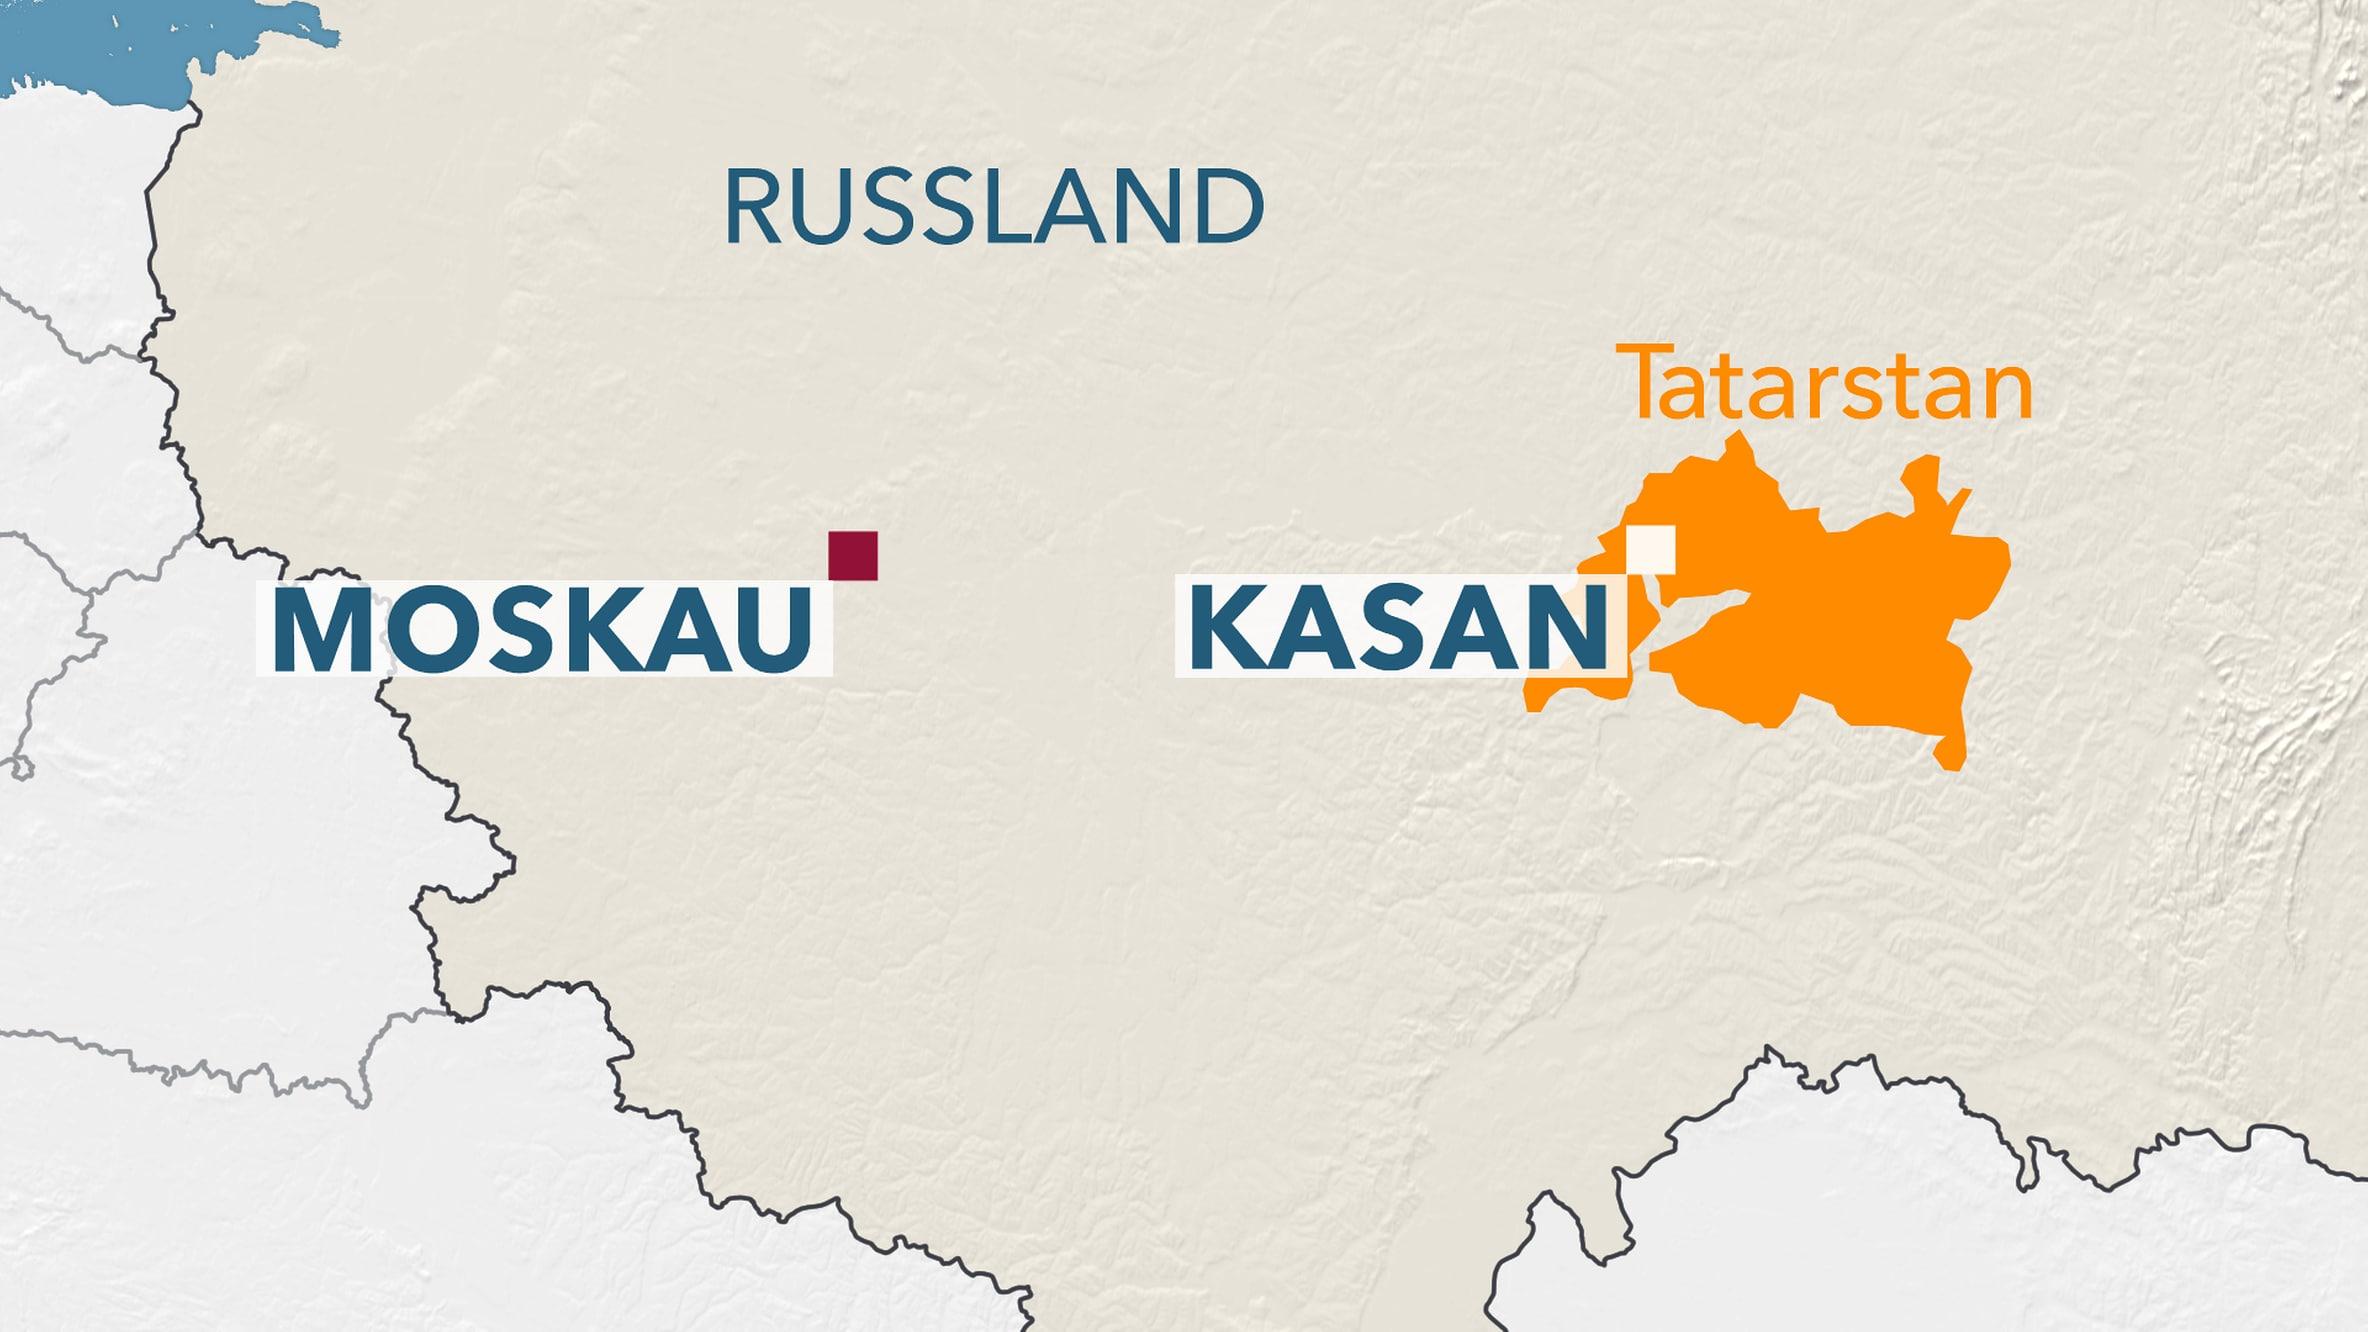 Tatarstan – Kann man das essen?